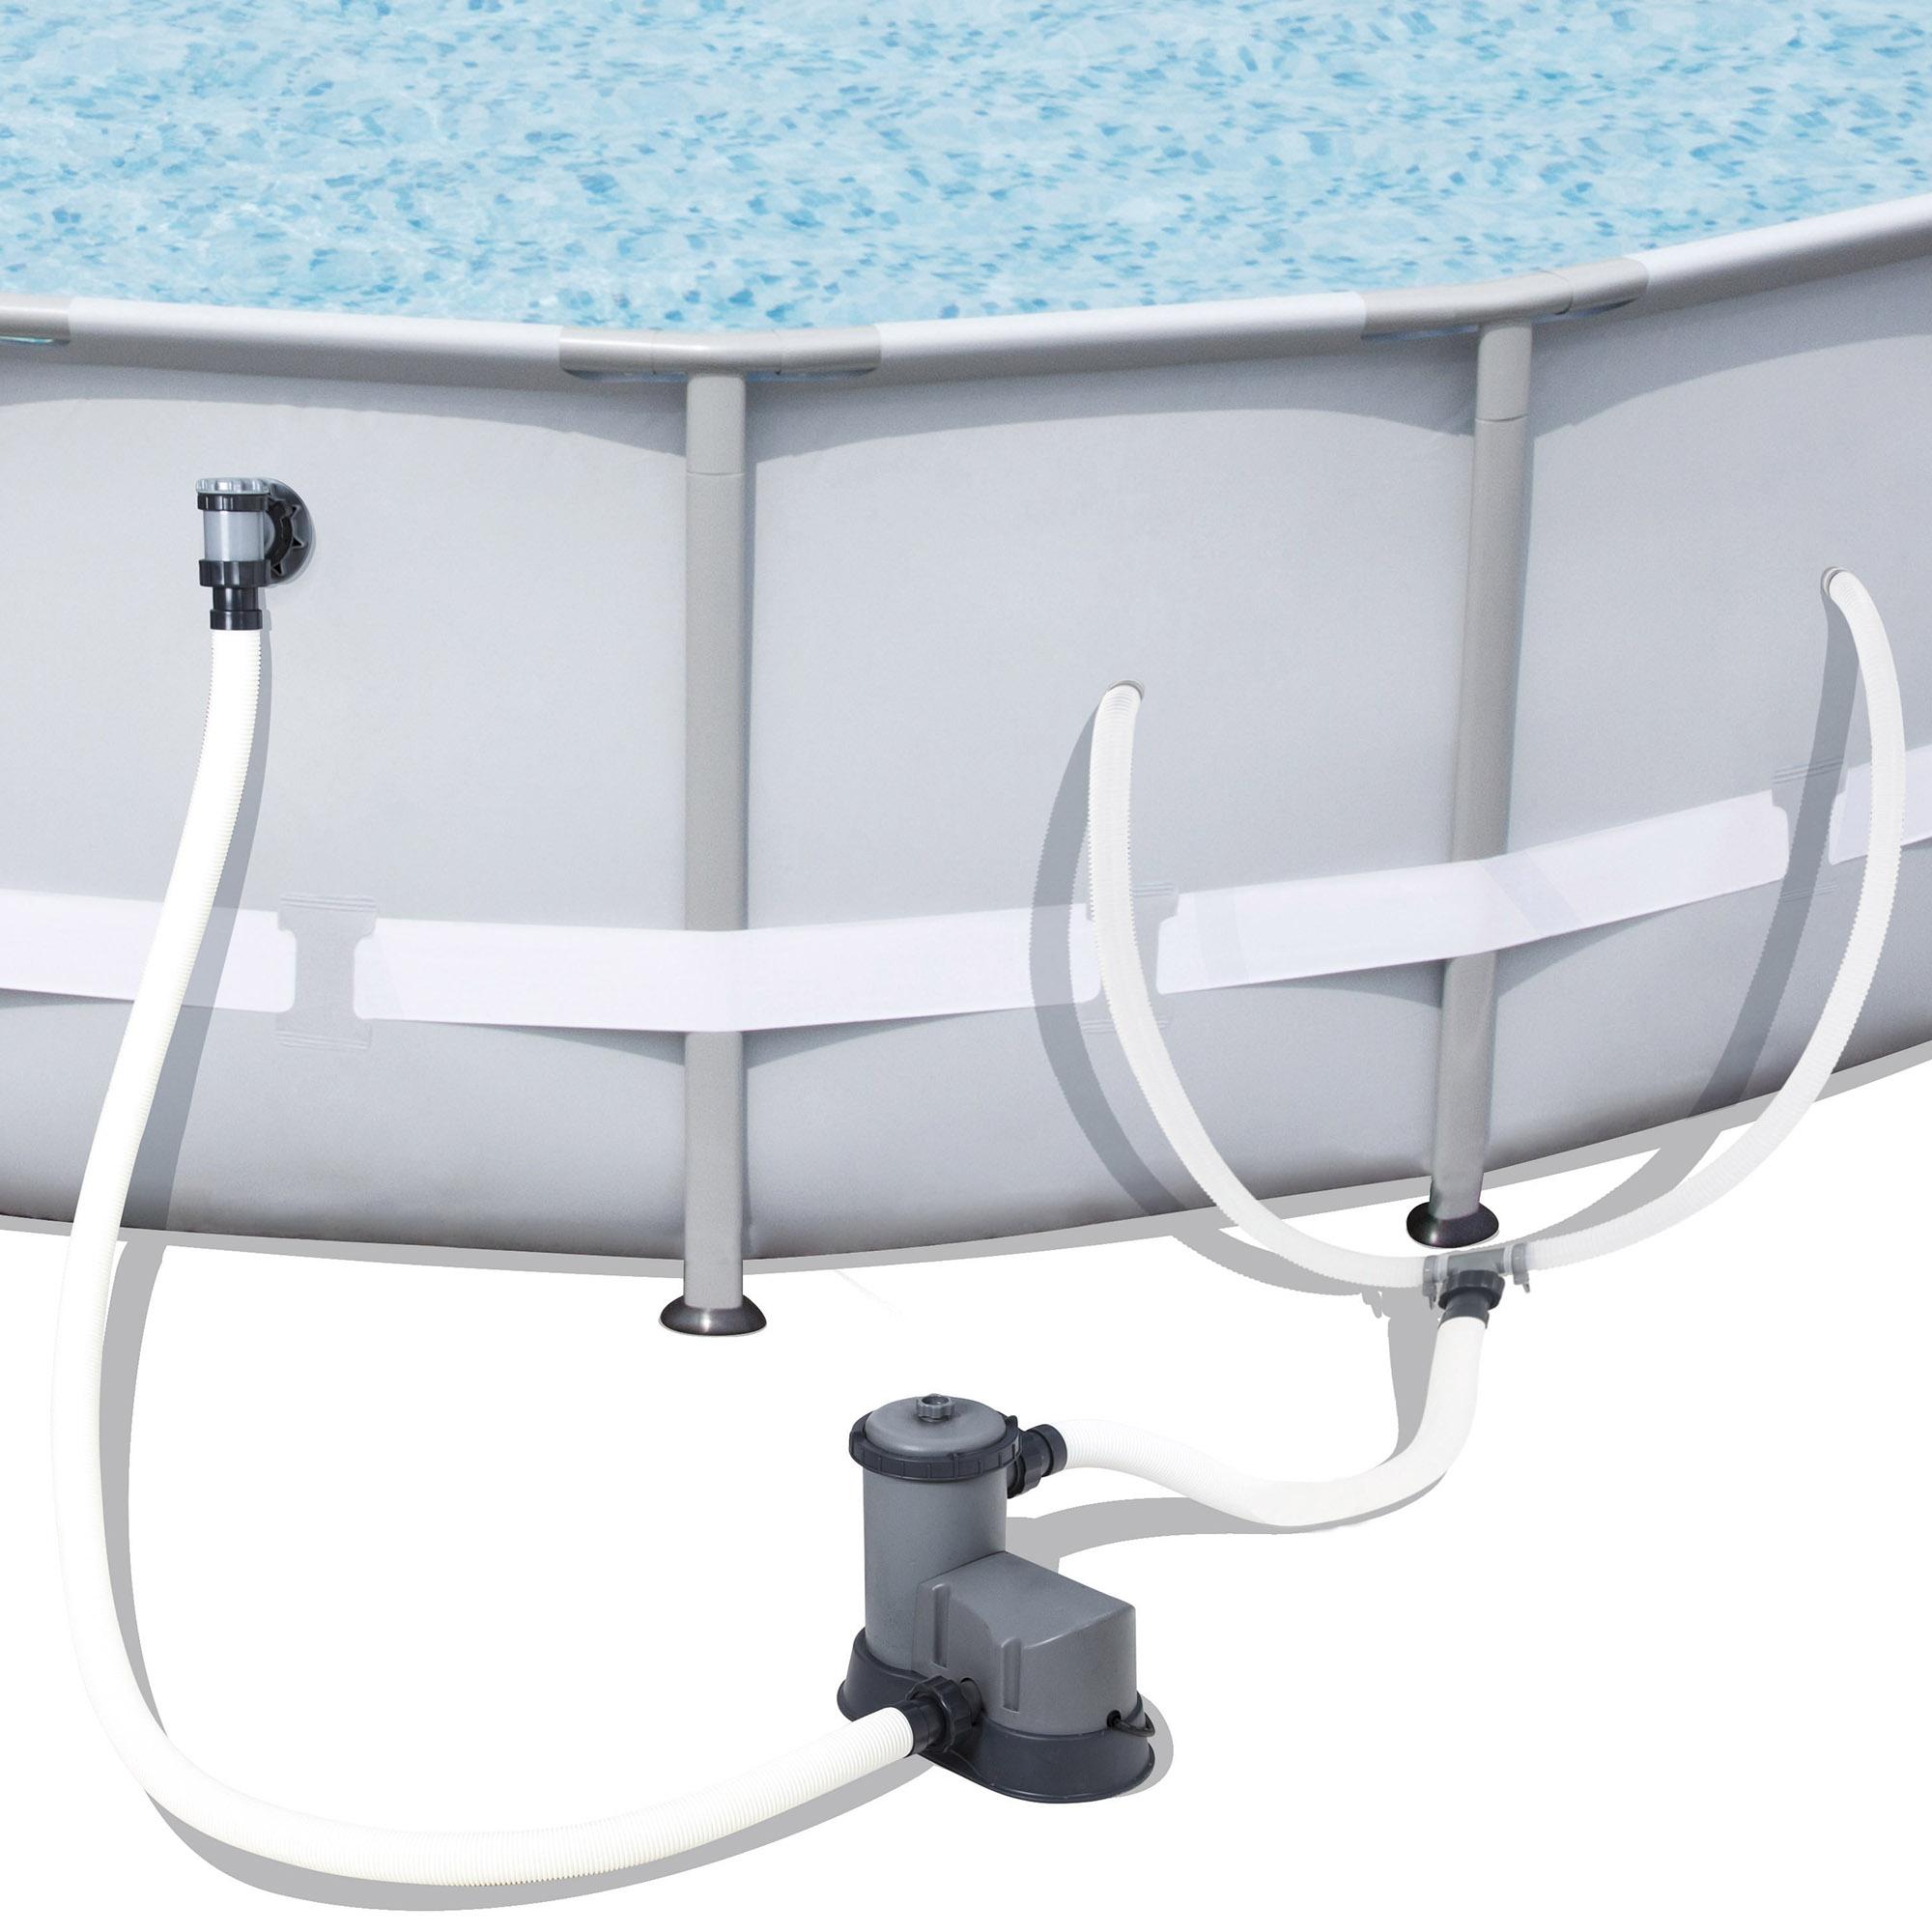 Bestway steel pro 18 39 x 48 frame pool set w pump ladder for Frame pool obi